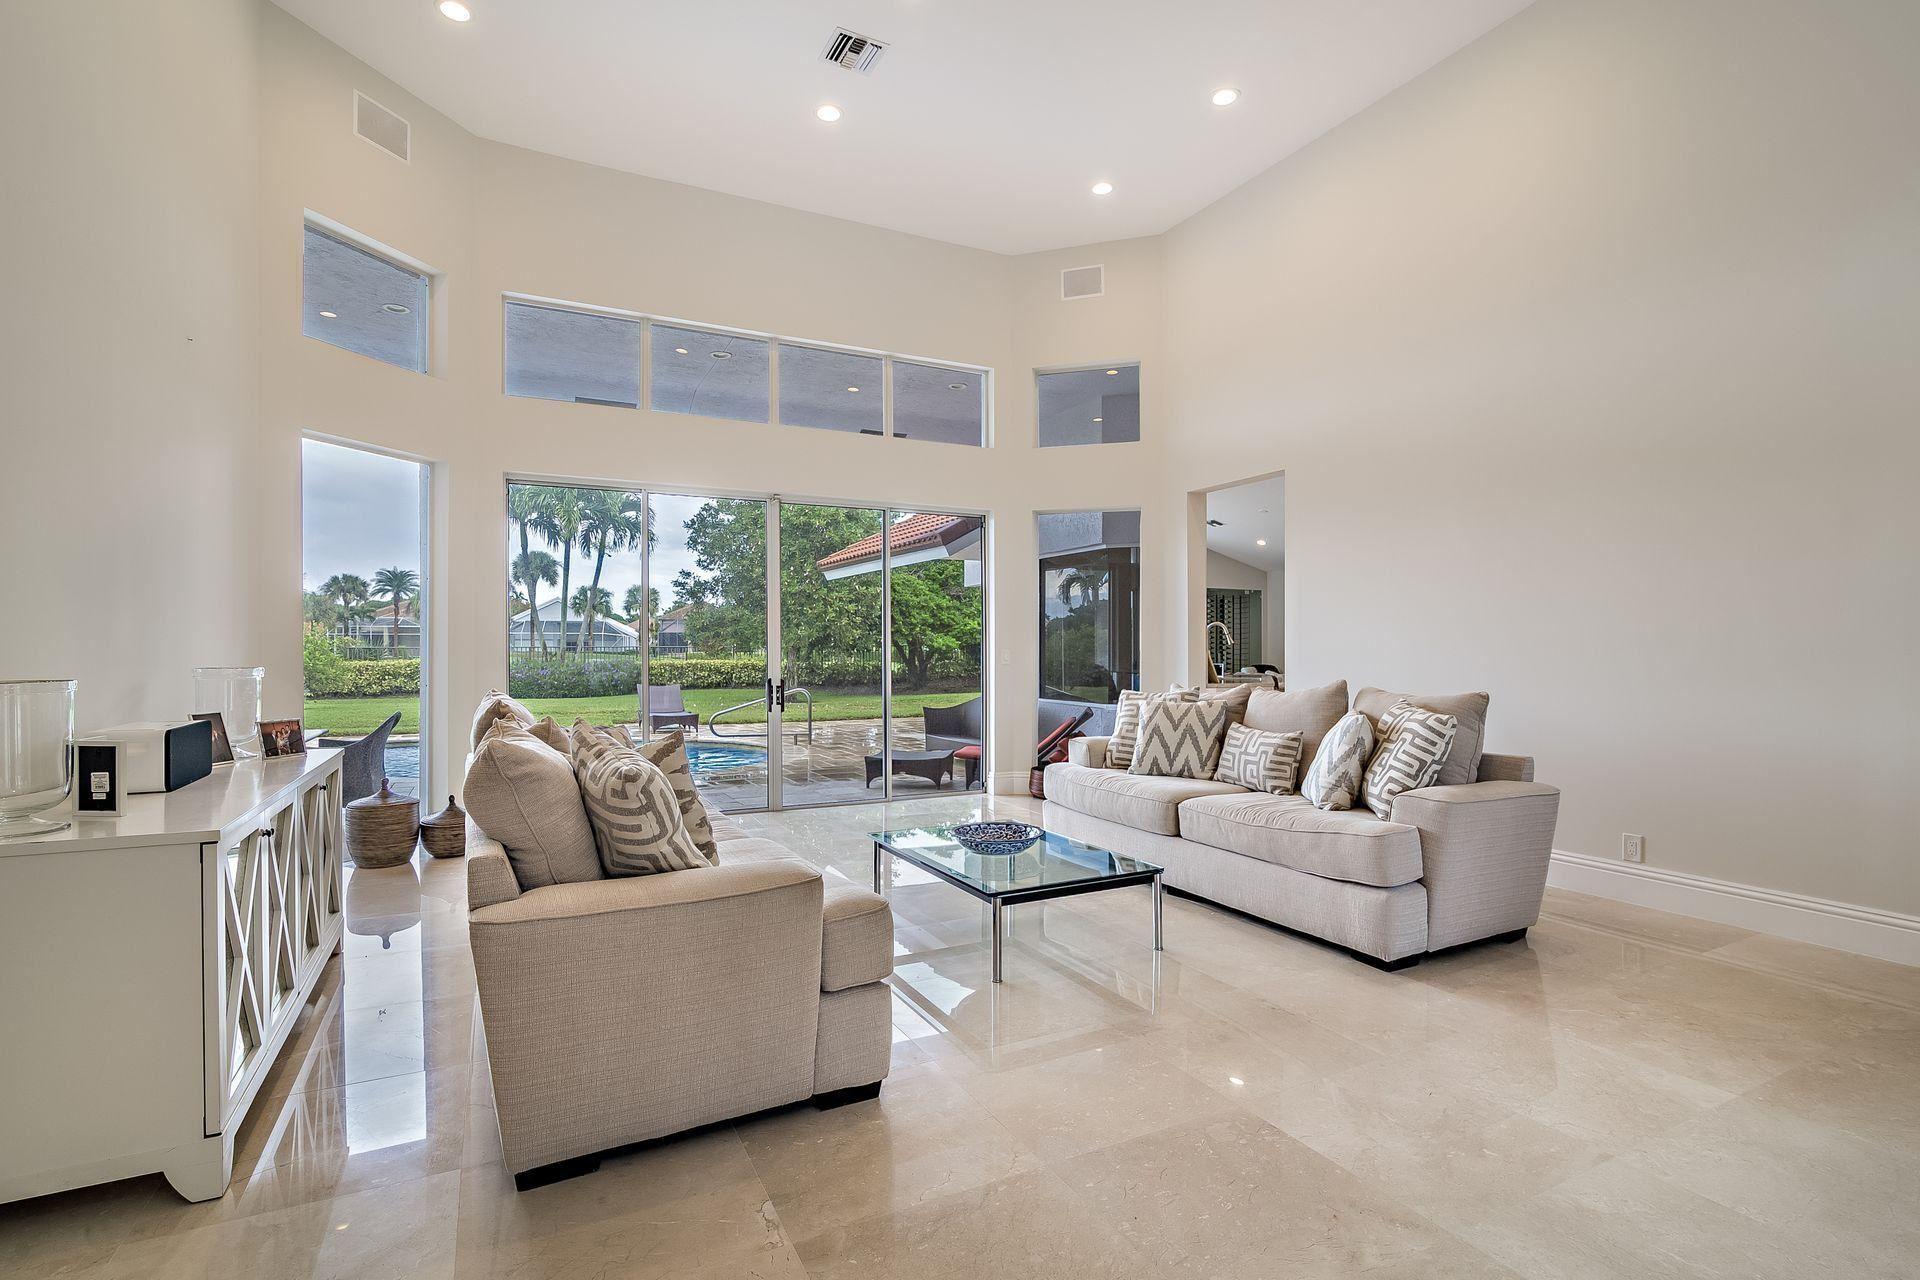 Photo of 44 St James Drive, Palm Beach Gardens, FL 33418 (MLS # RX-10633456)